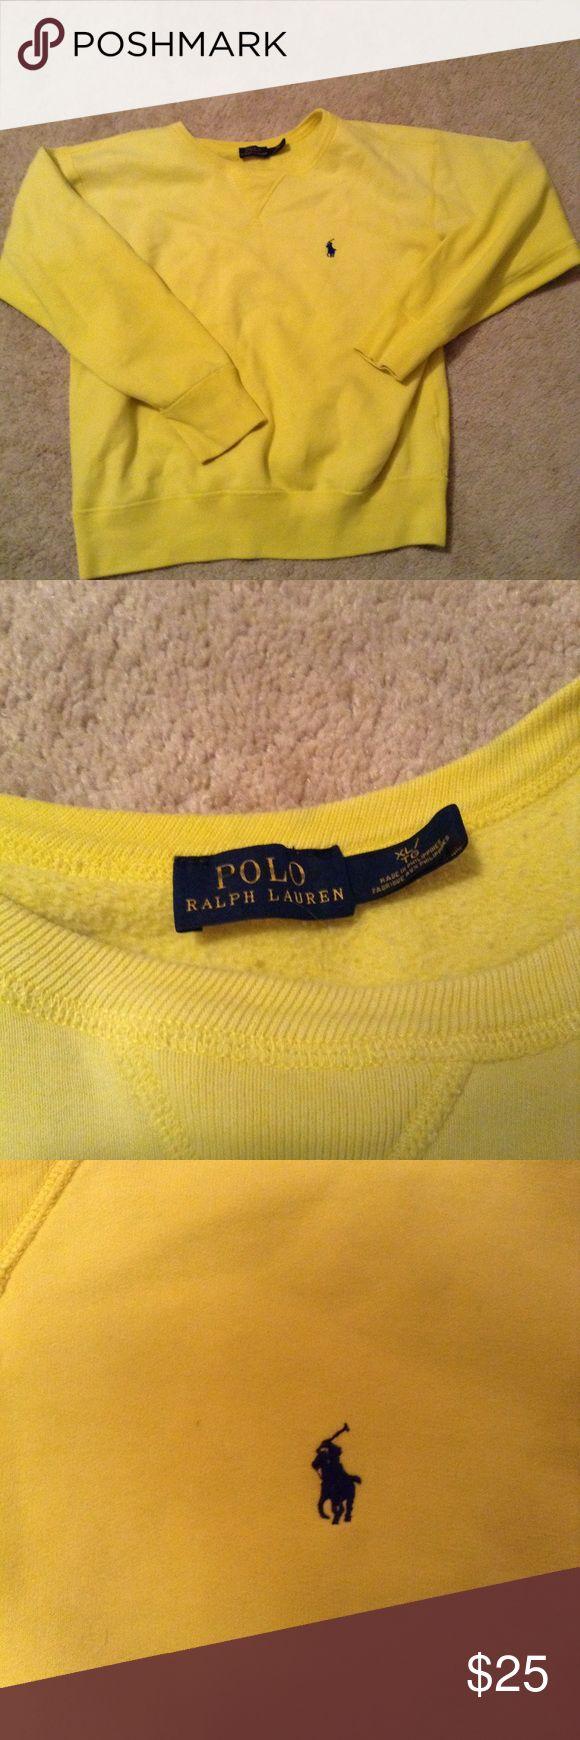 Polo Ralph Lauren Sweatshirt Crewneck style sweatshirt. Soft brushed in size women's xl. Bright yellow Polo by Ralph Lauren Tops Sweatshirts & Hoodies